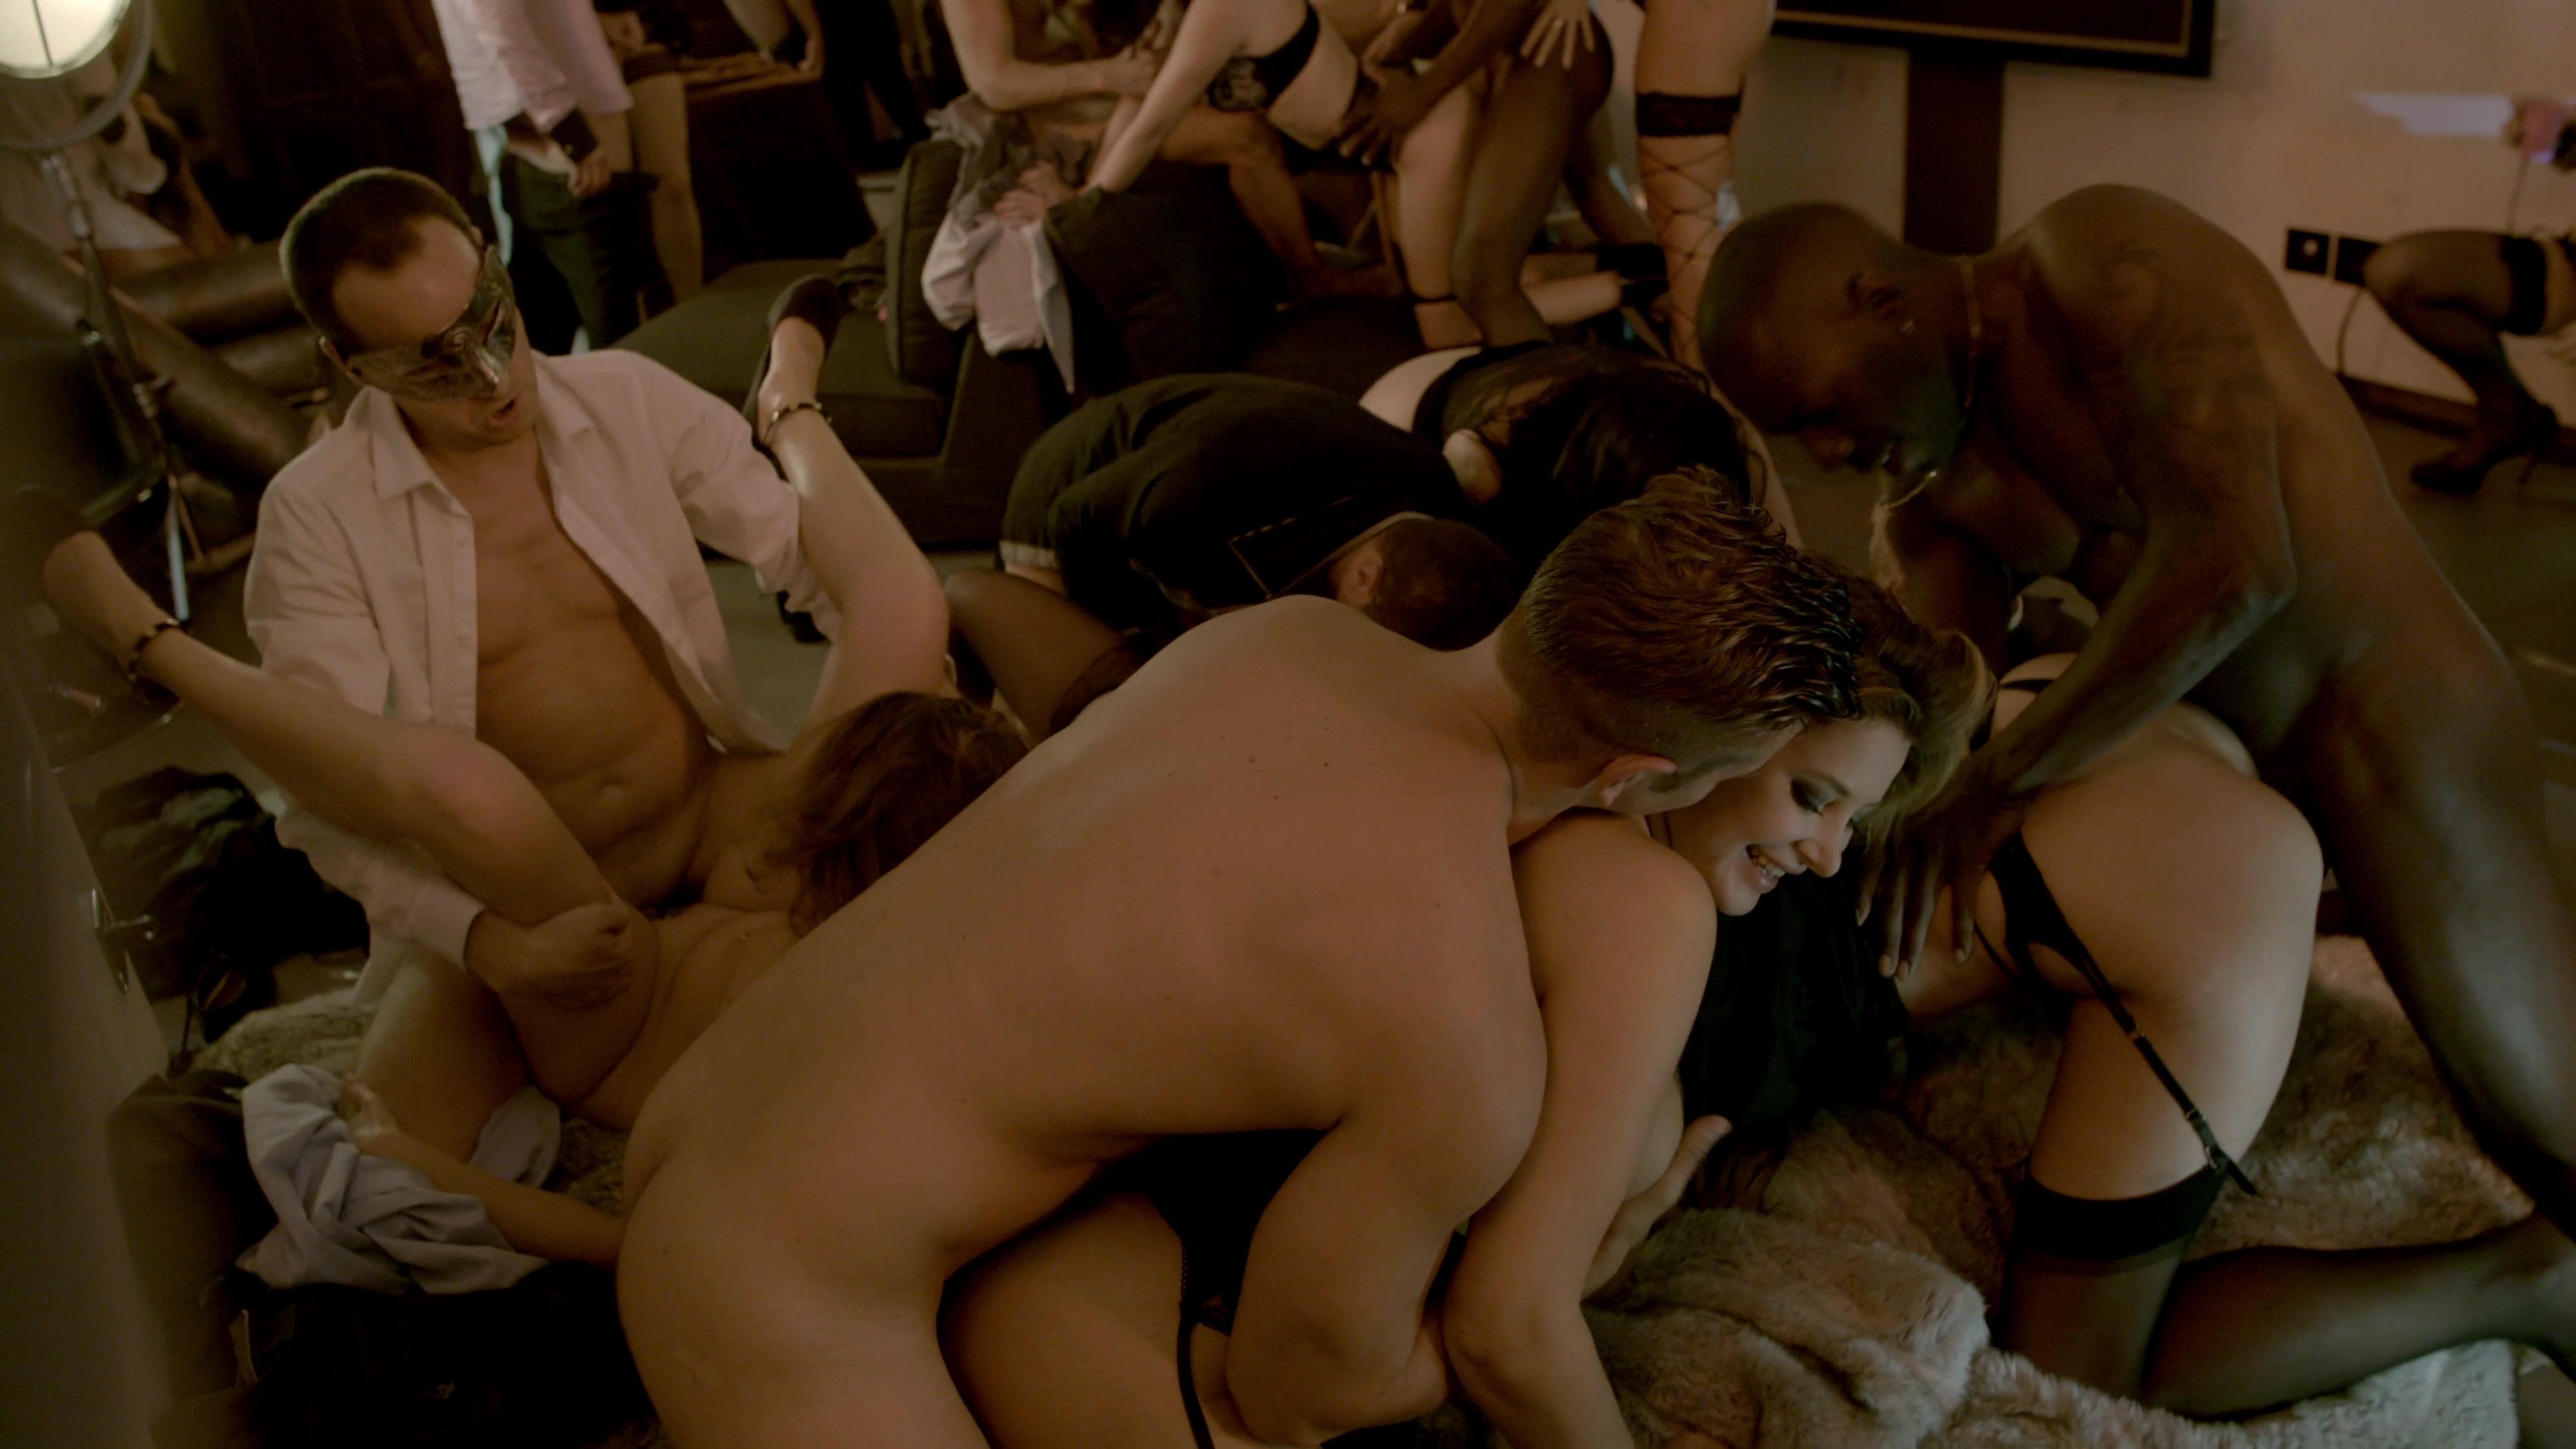 mother tube sex movie xxx